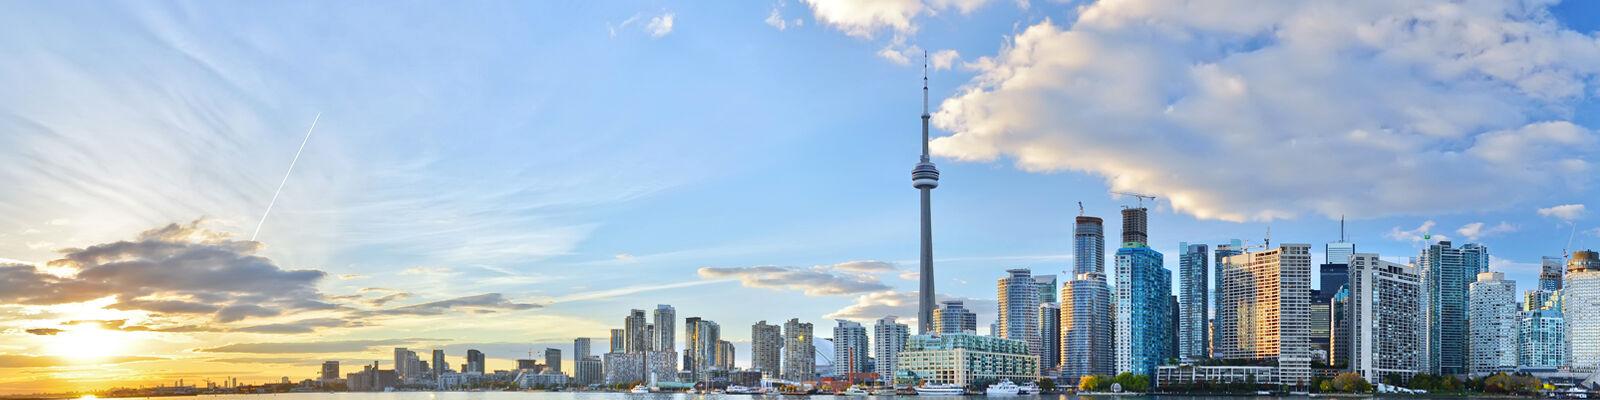 Amica Senior Lifestyles - Toronto Skyline